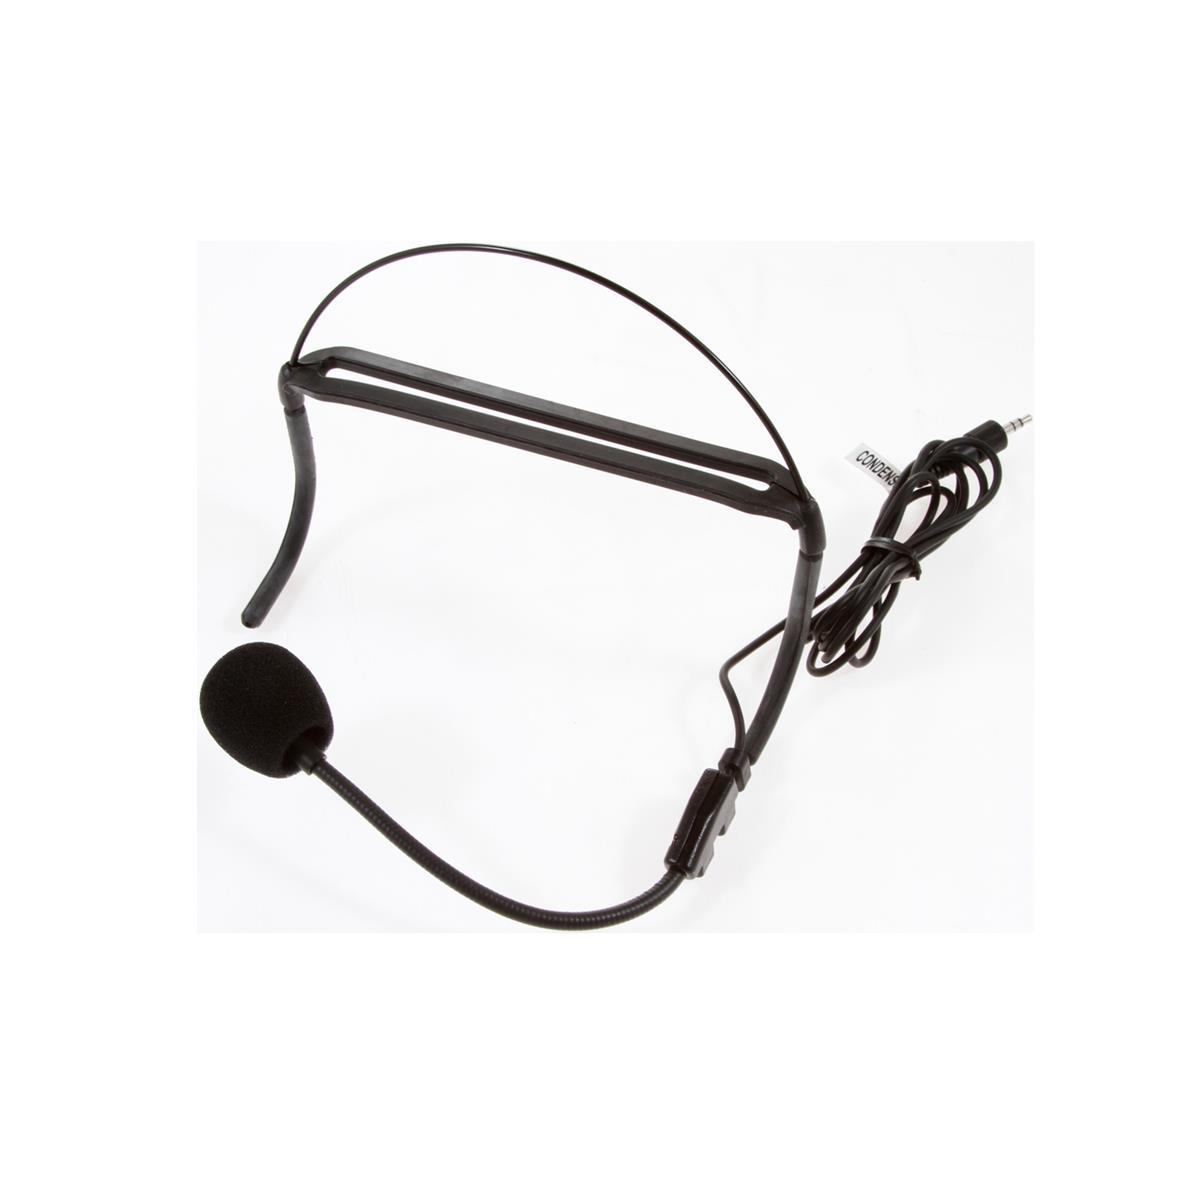 Samson HS5 - microfono headset per Concert 88